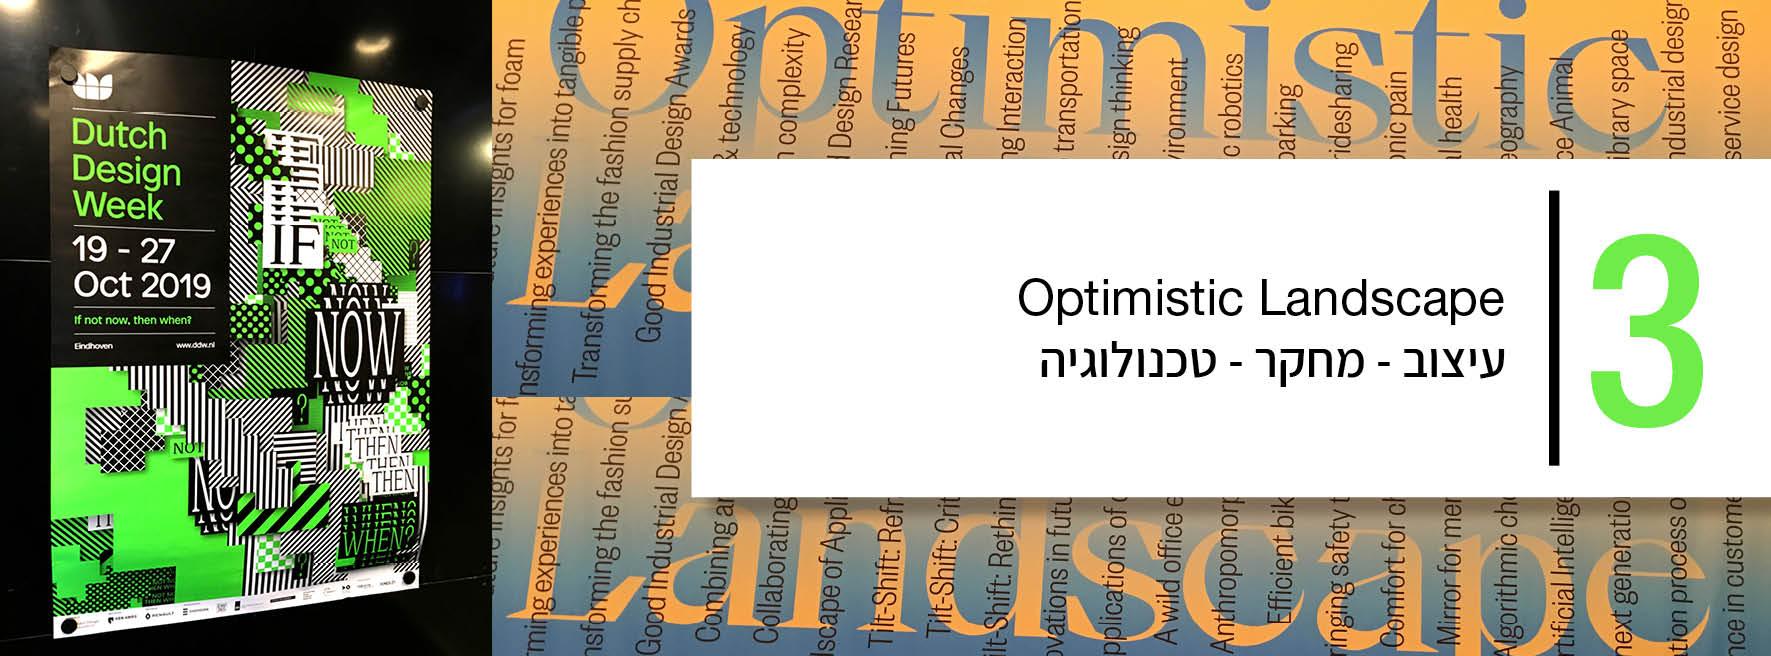 Optimistic Landscape. עיצוב-מחקר-טכנולוגיה